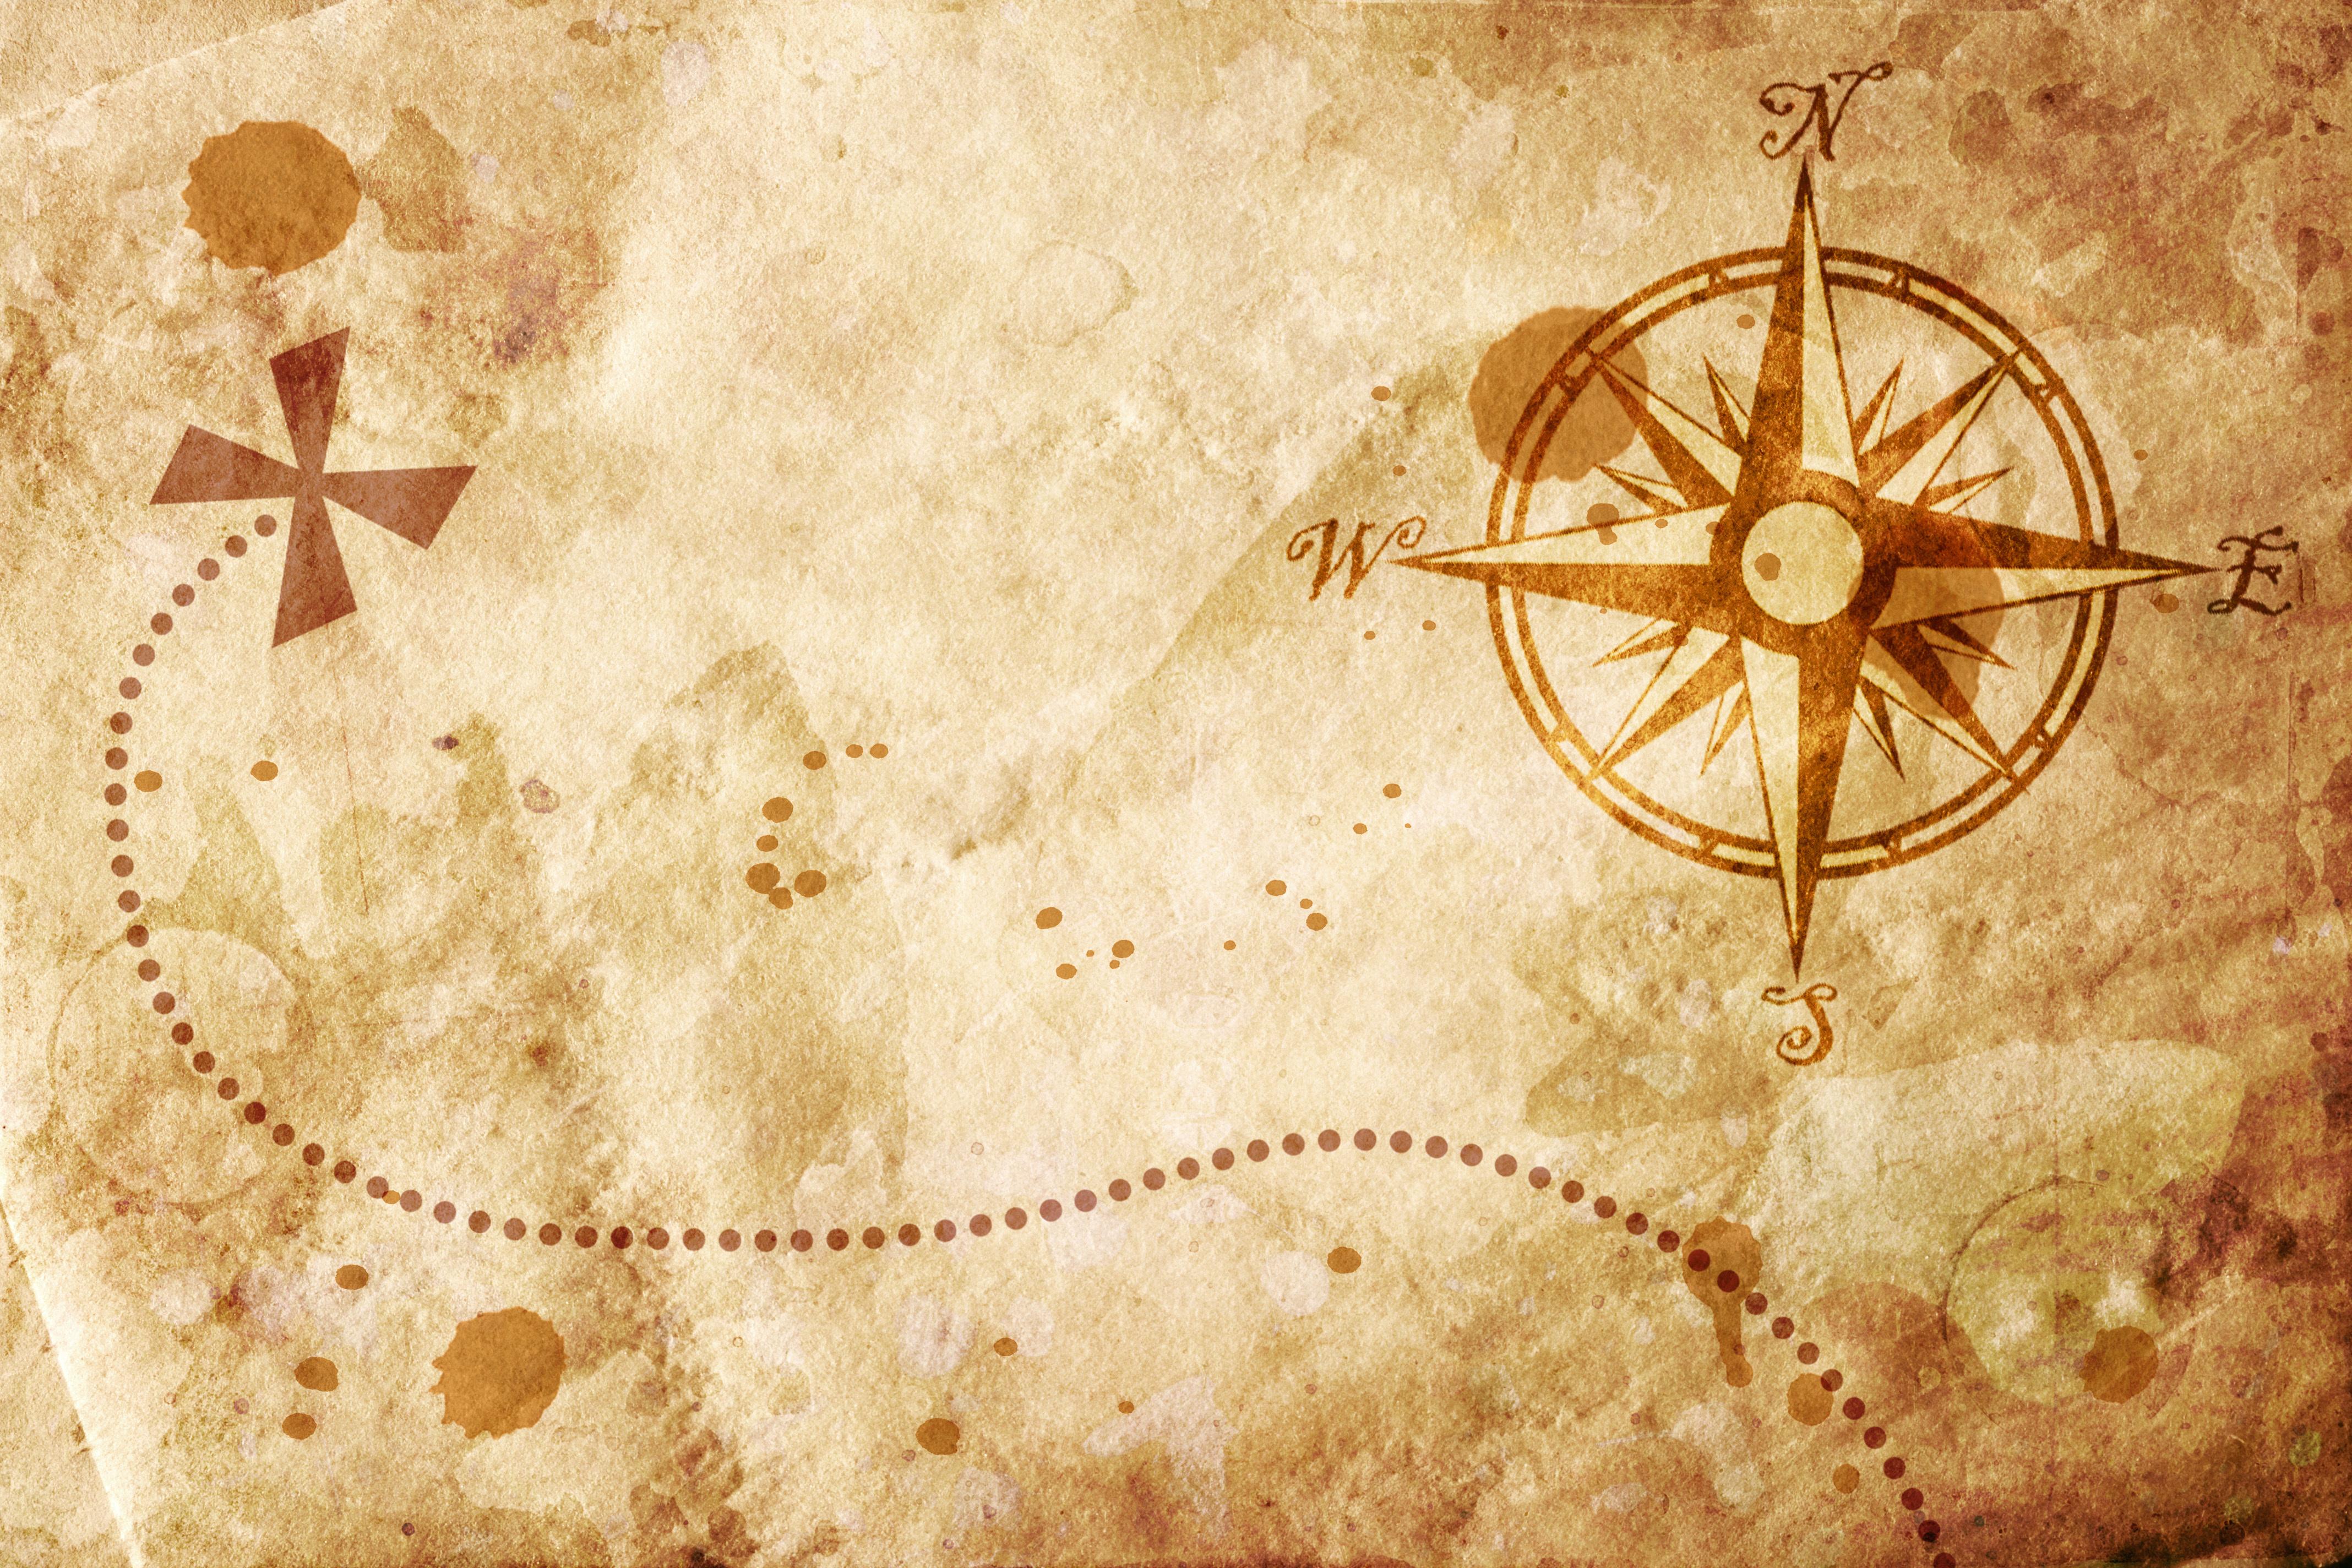 Old Map Background - WallpaperSafari